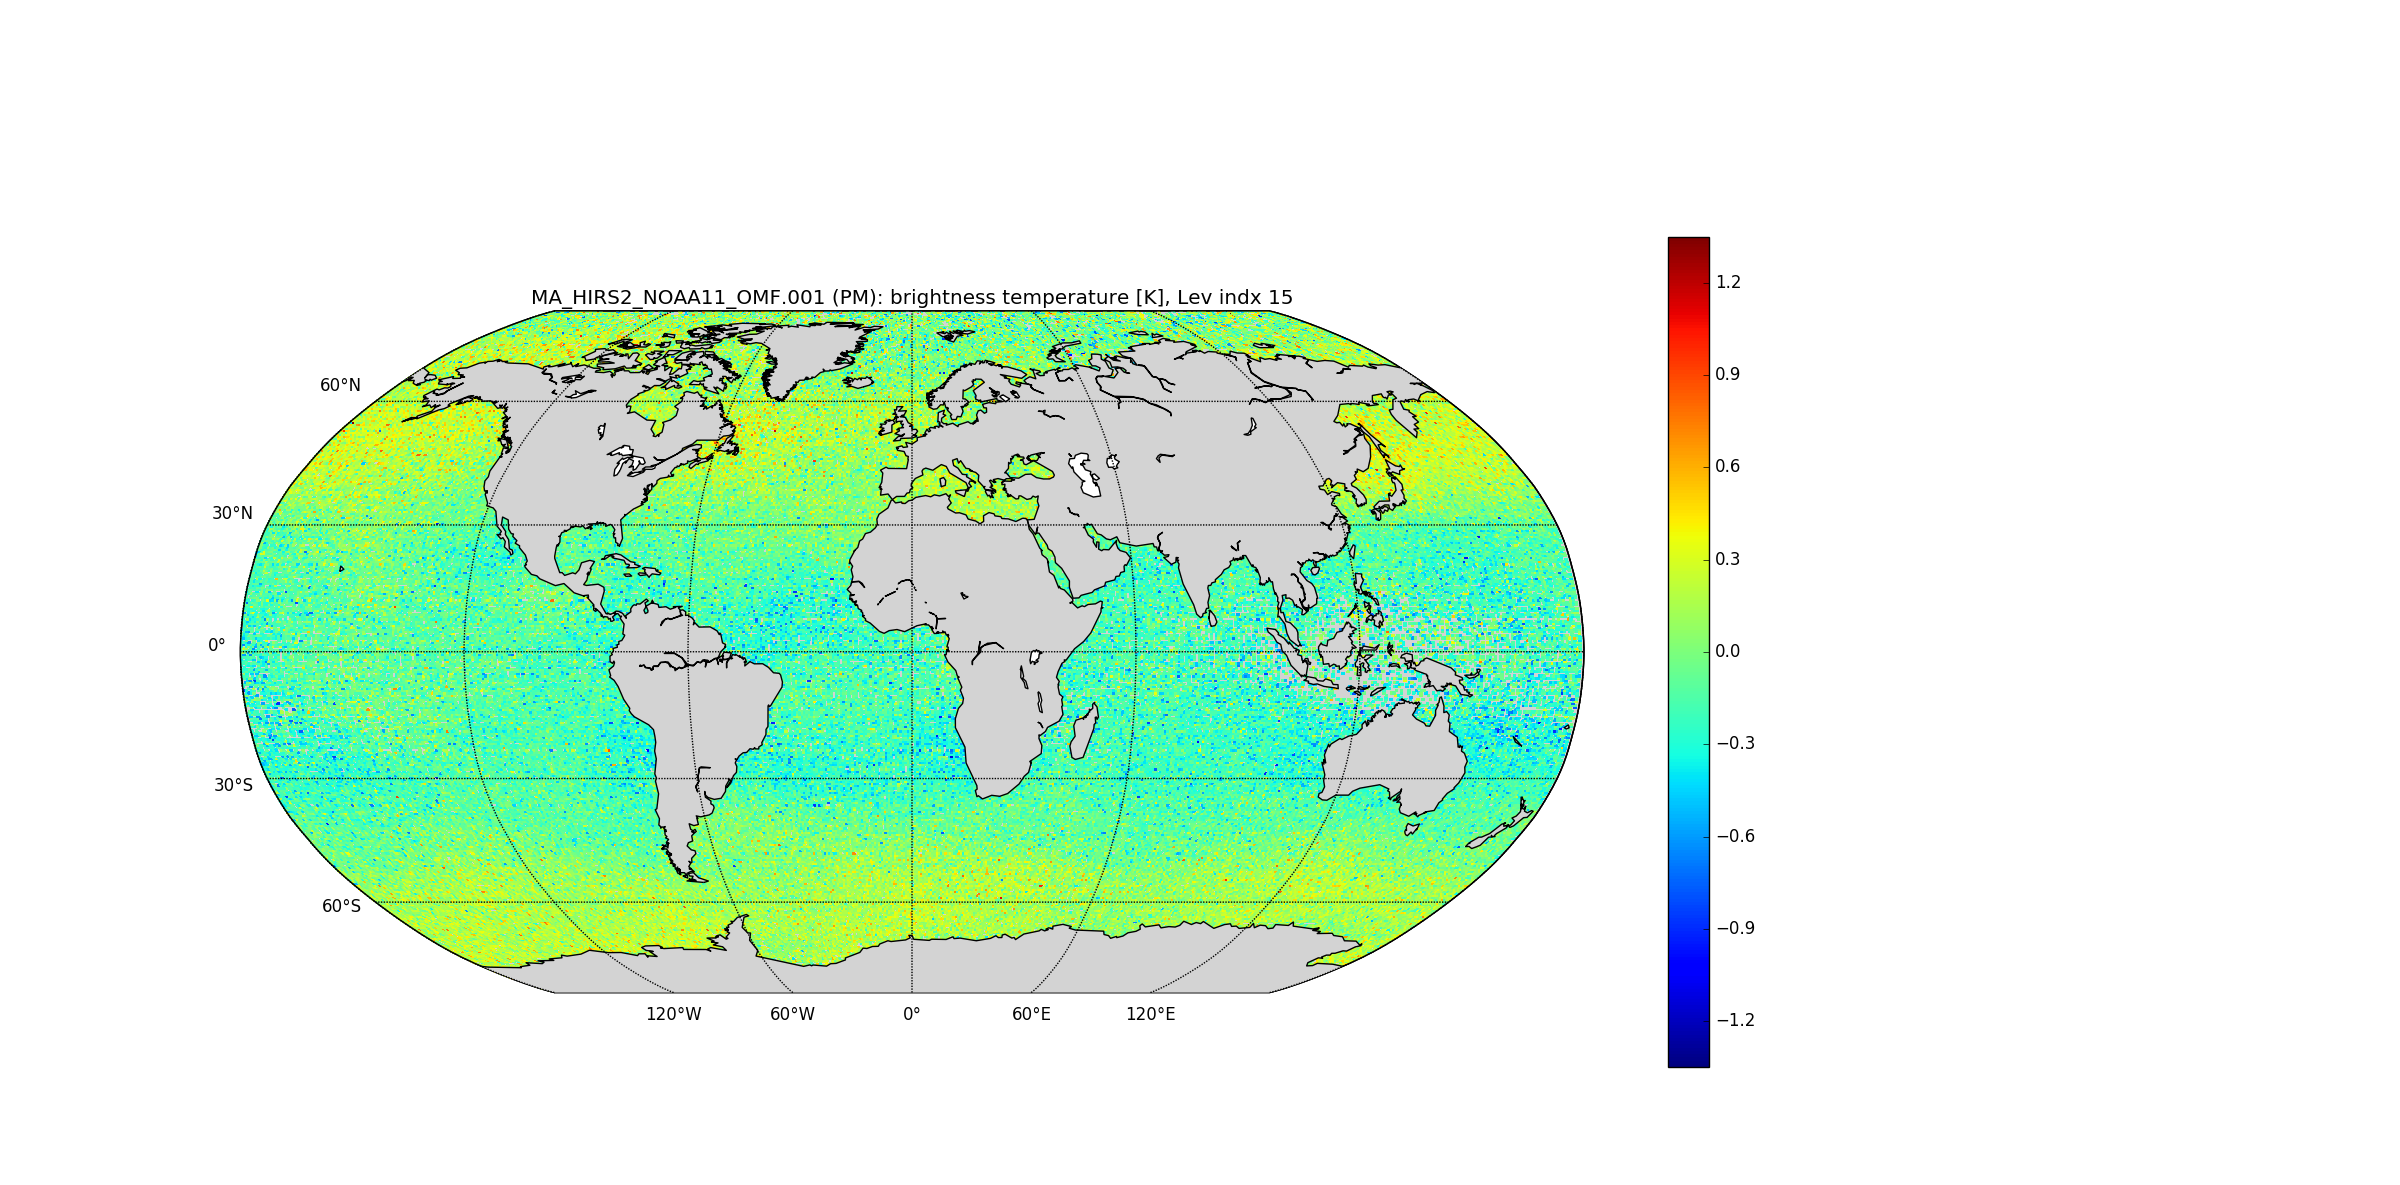 MA_HIRS2_NOAA11_OMF variable